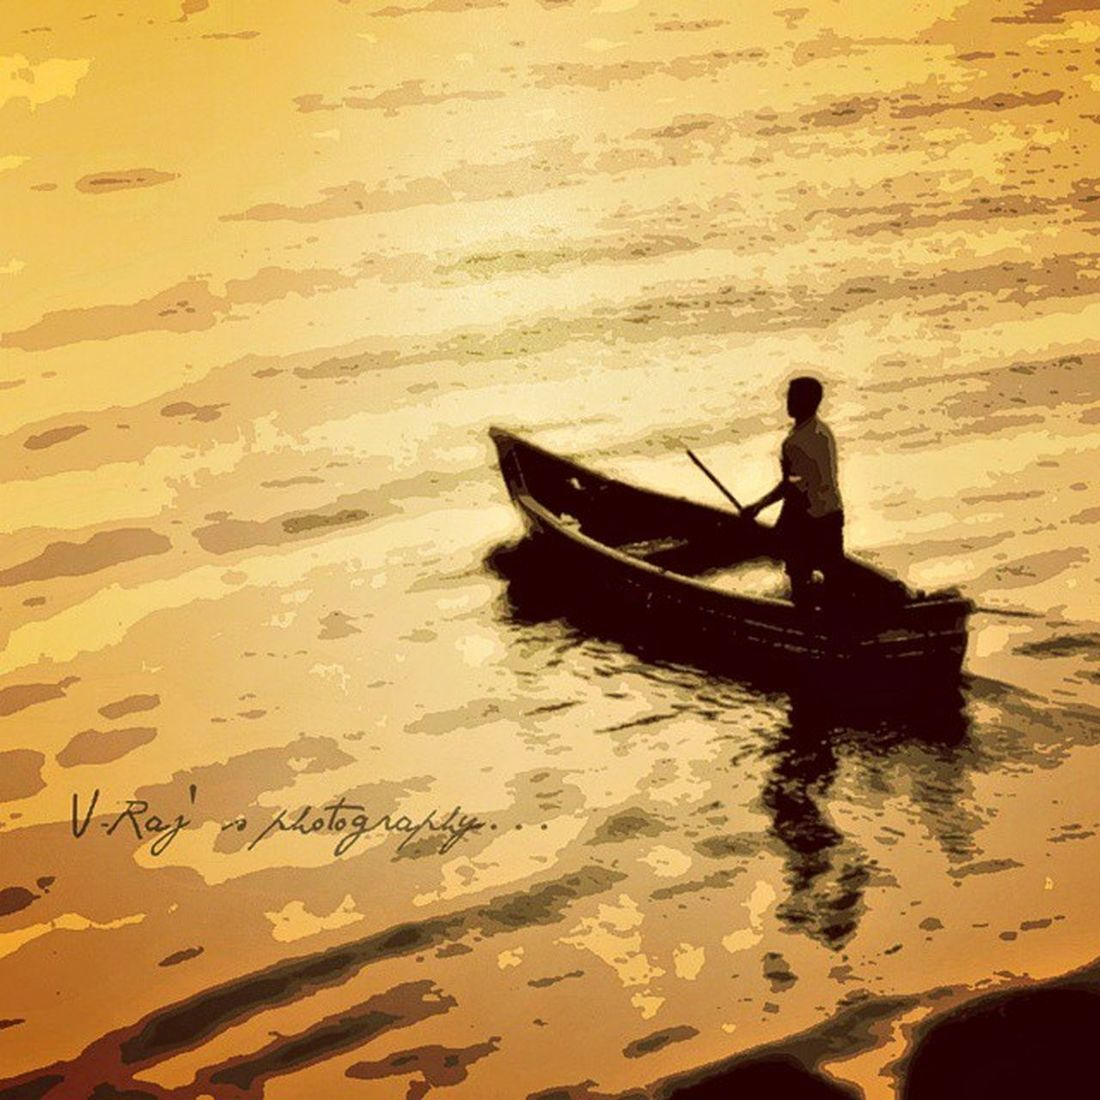 In the Ocean- Conjoiner rejoinder poisoner concealer revelator Voyage Ocean Mumbai Marindrive sunset